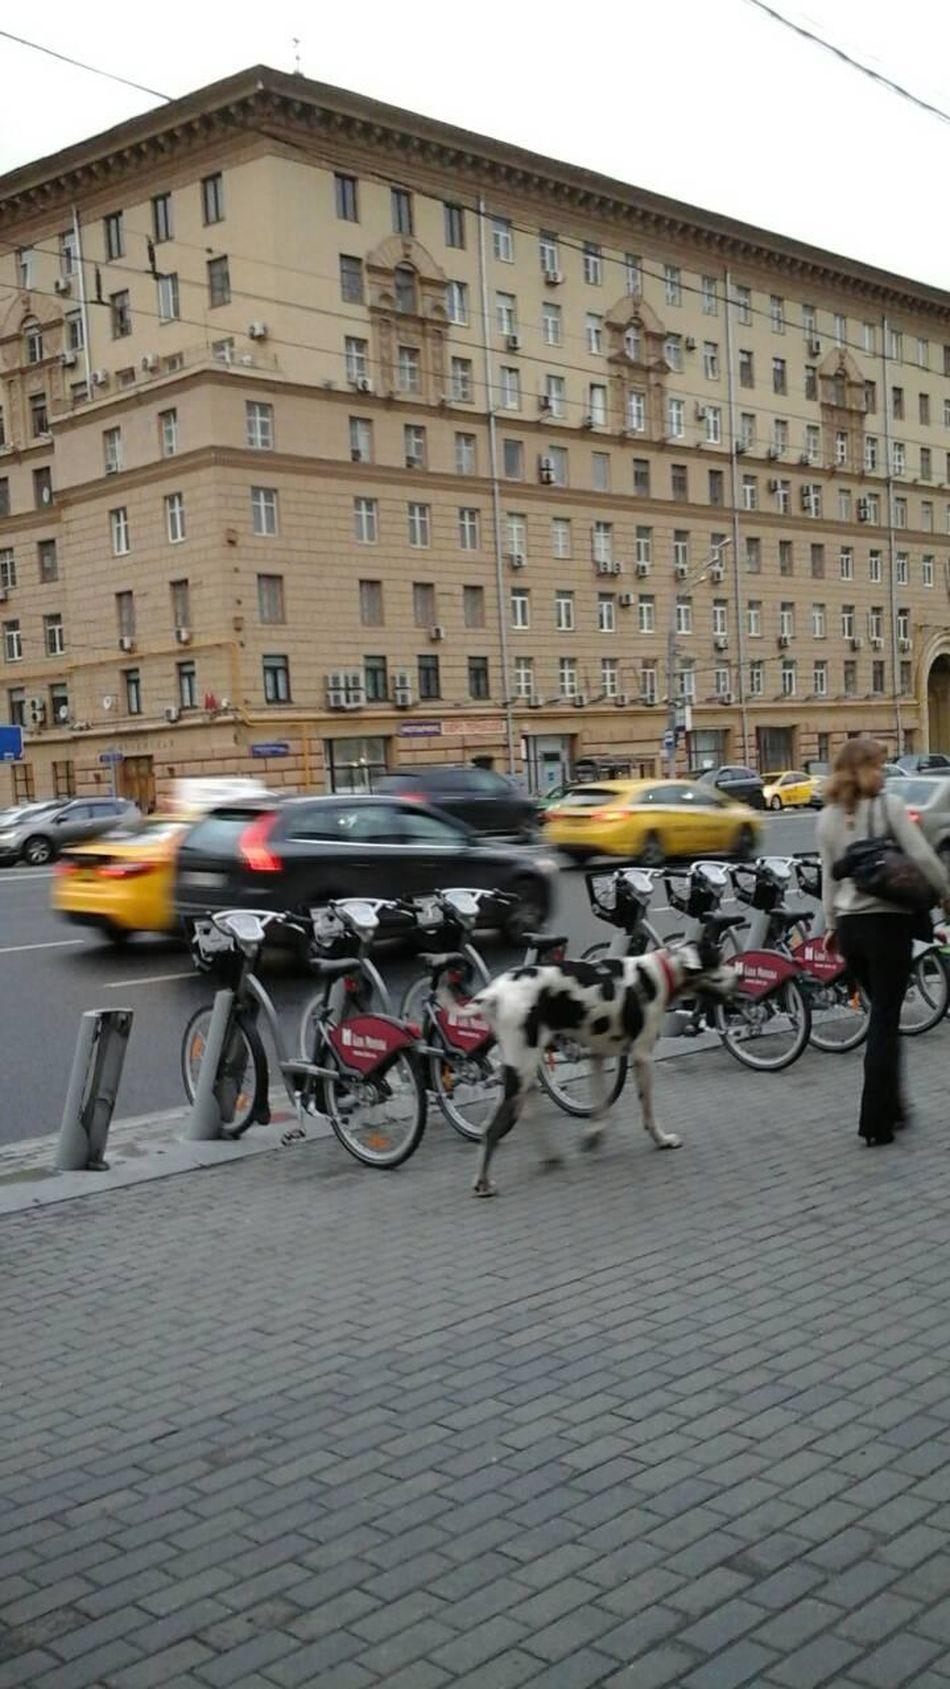 Blurs Summer Moscow Eyeemphotography Street Photography The Street Photographer - 2016 EyeEm Awards The Photojournalist - 2016 EyeEm Awards